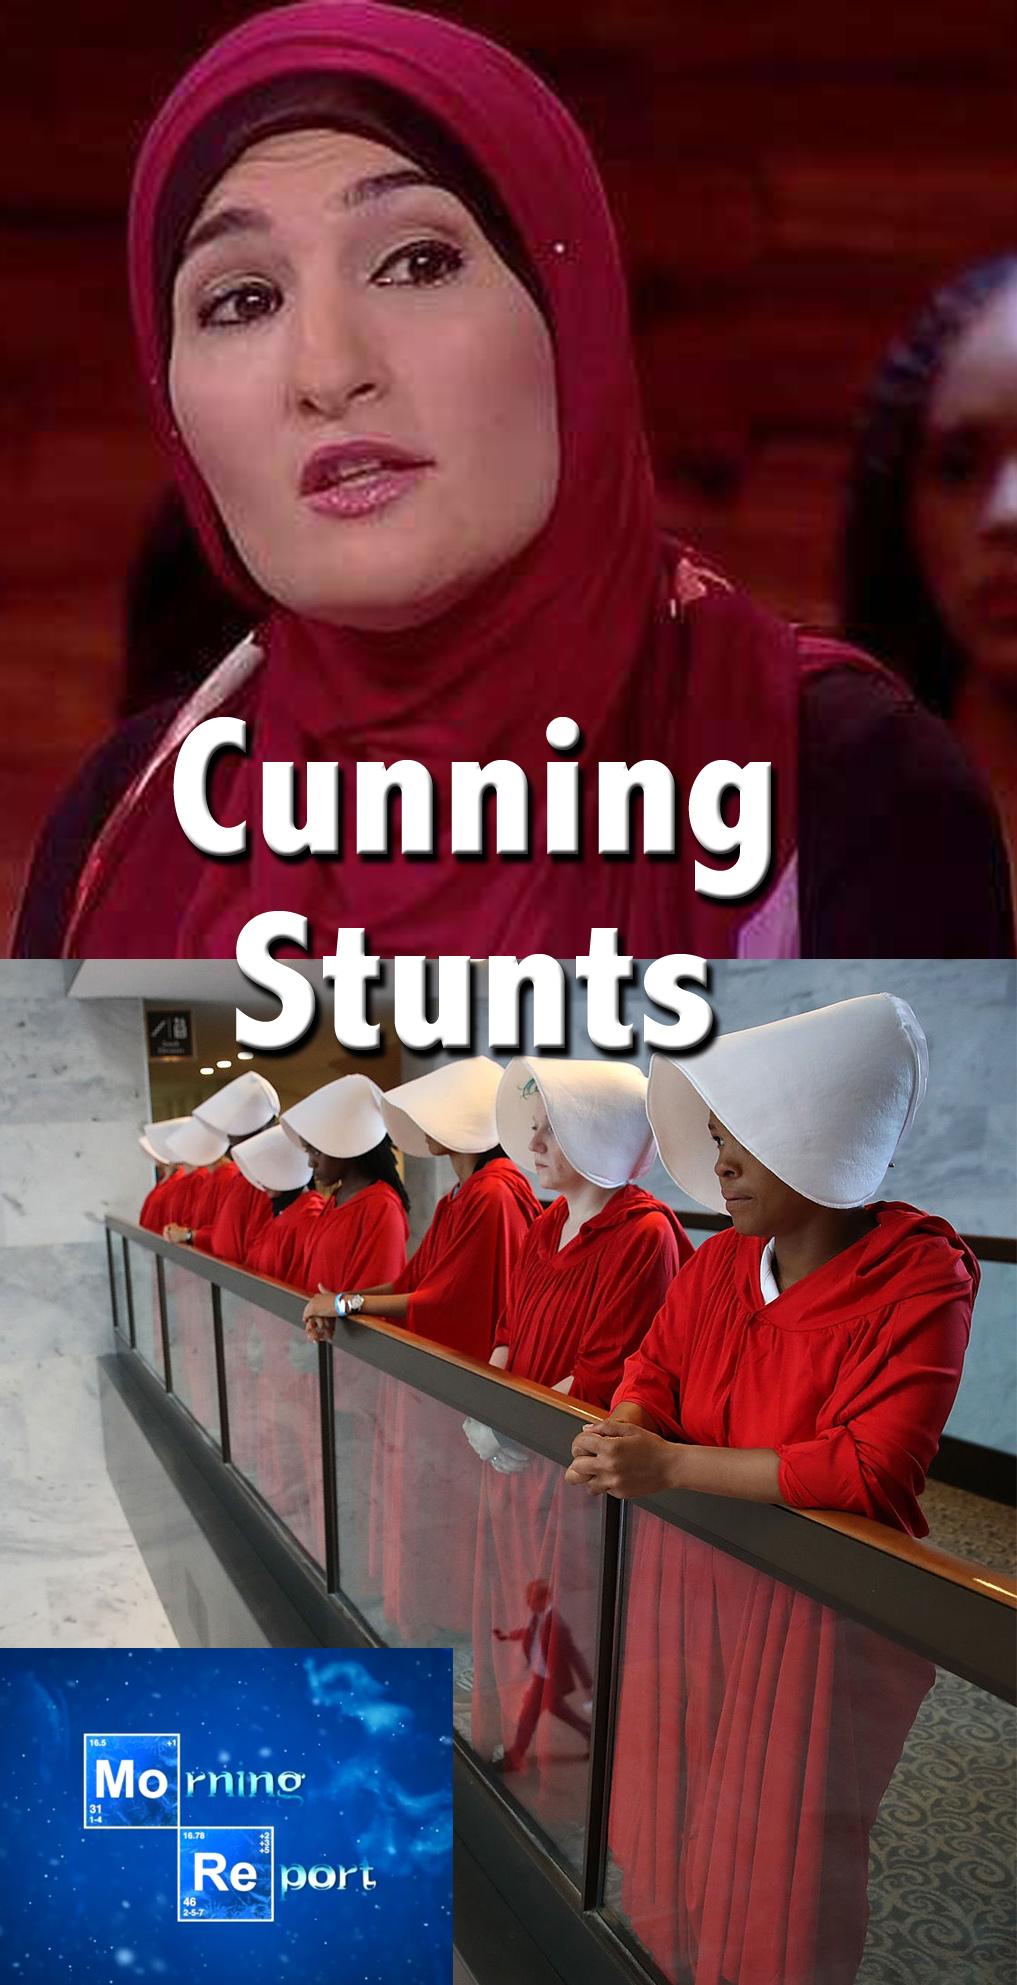 cunning.jpg